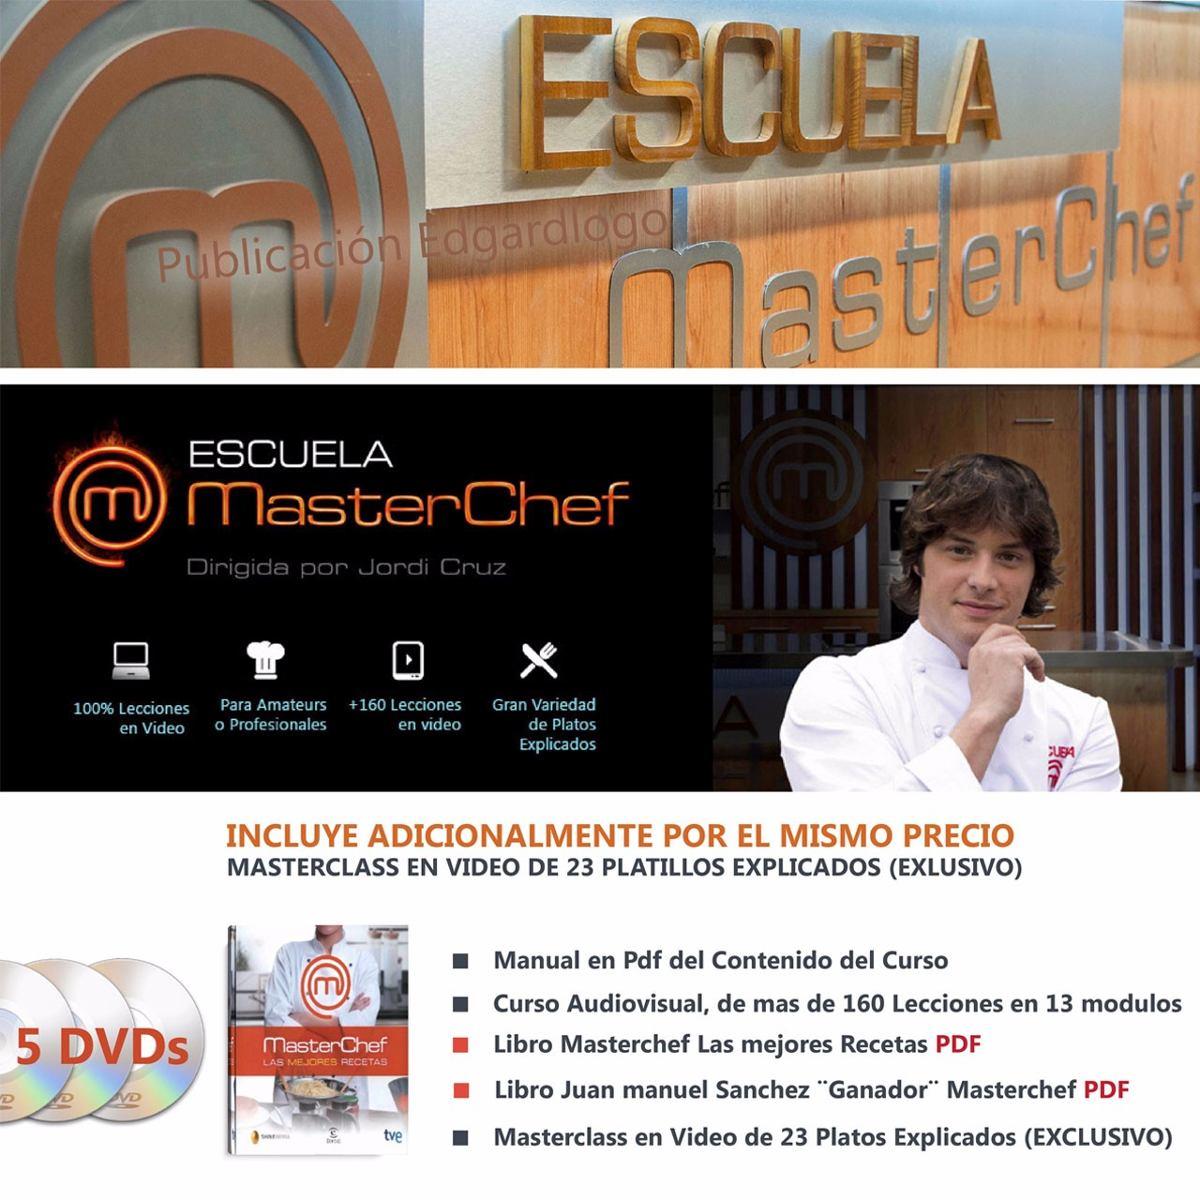 Curso Cocina Pdf   Curso En 5 Dvd Cocina Masterchef Libros Pdf Clases Chef Bs 20